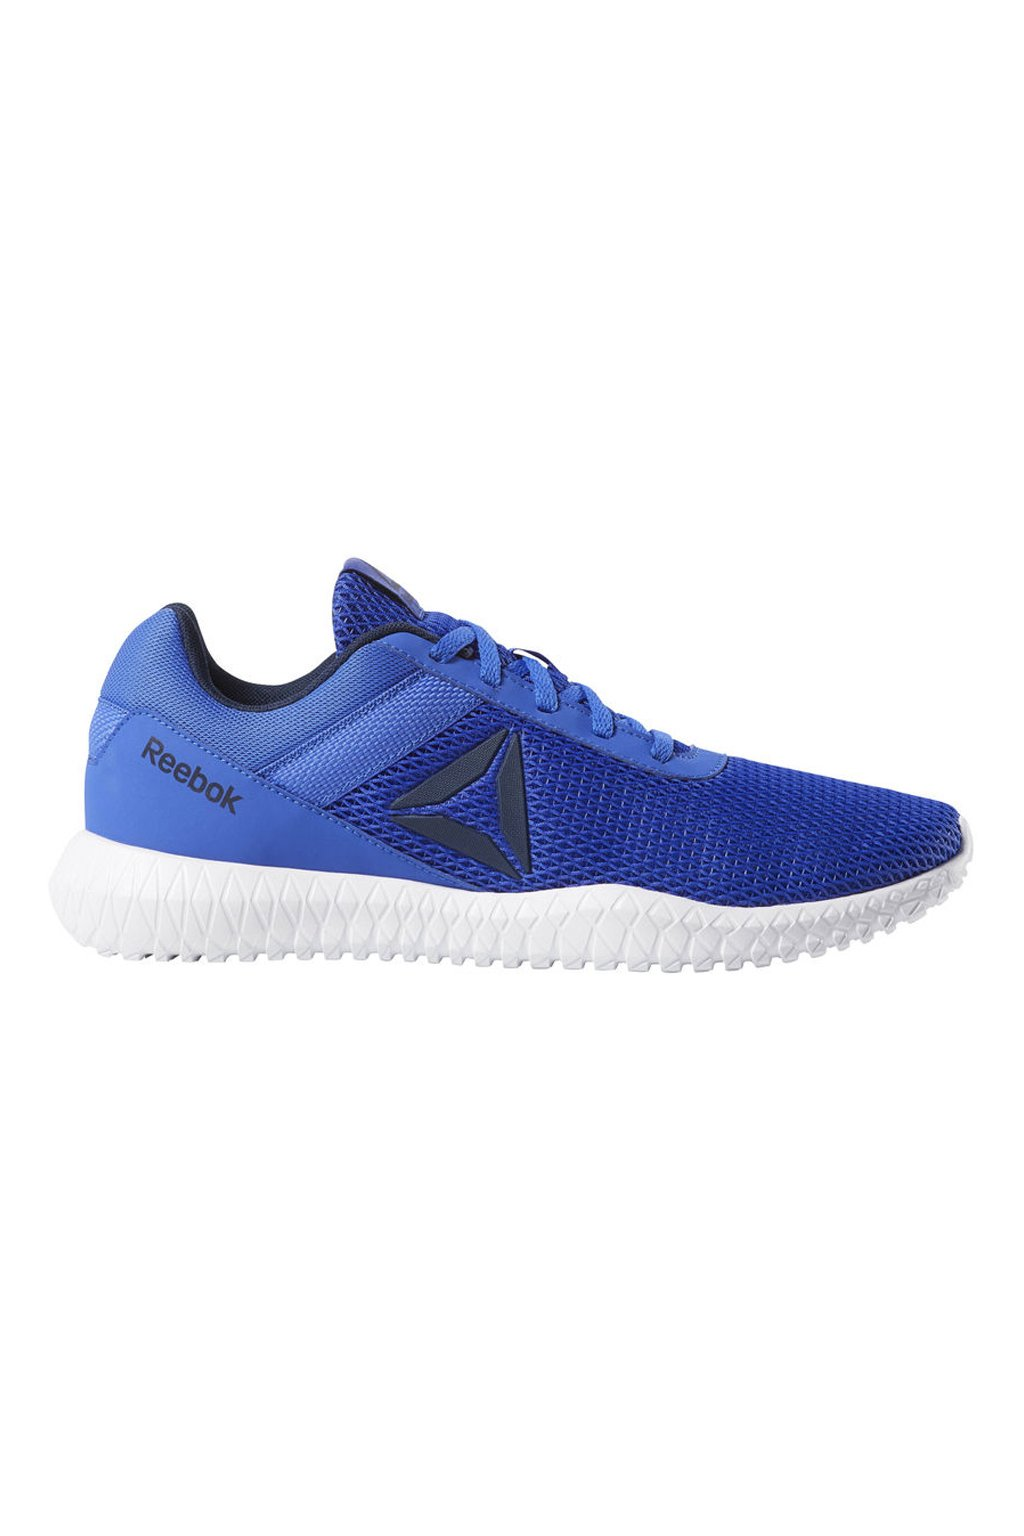 Pánska obuv Reebok Flexagon Energy TR modré DV4780